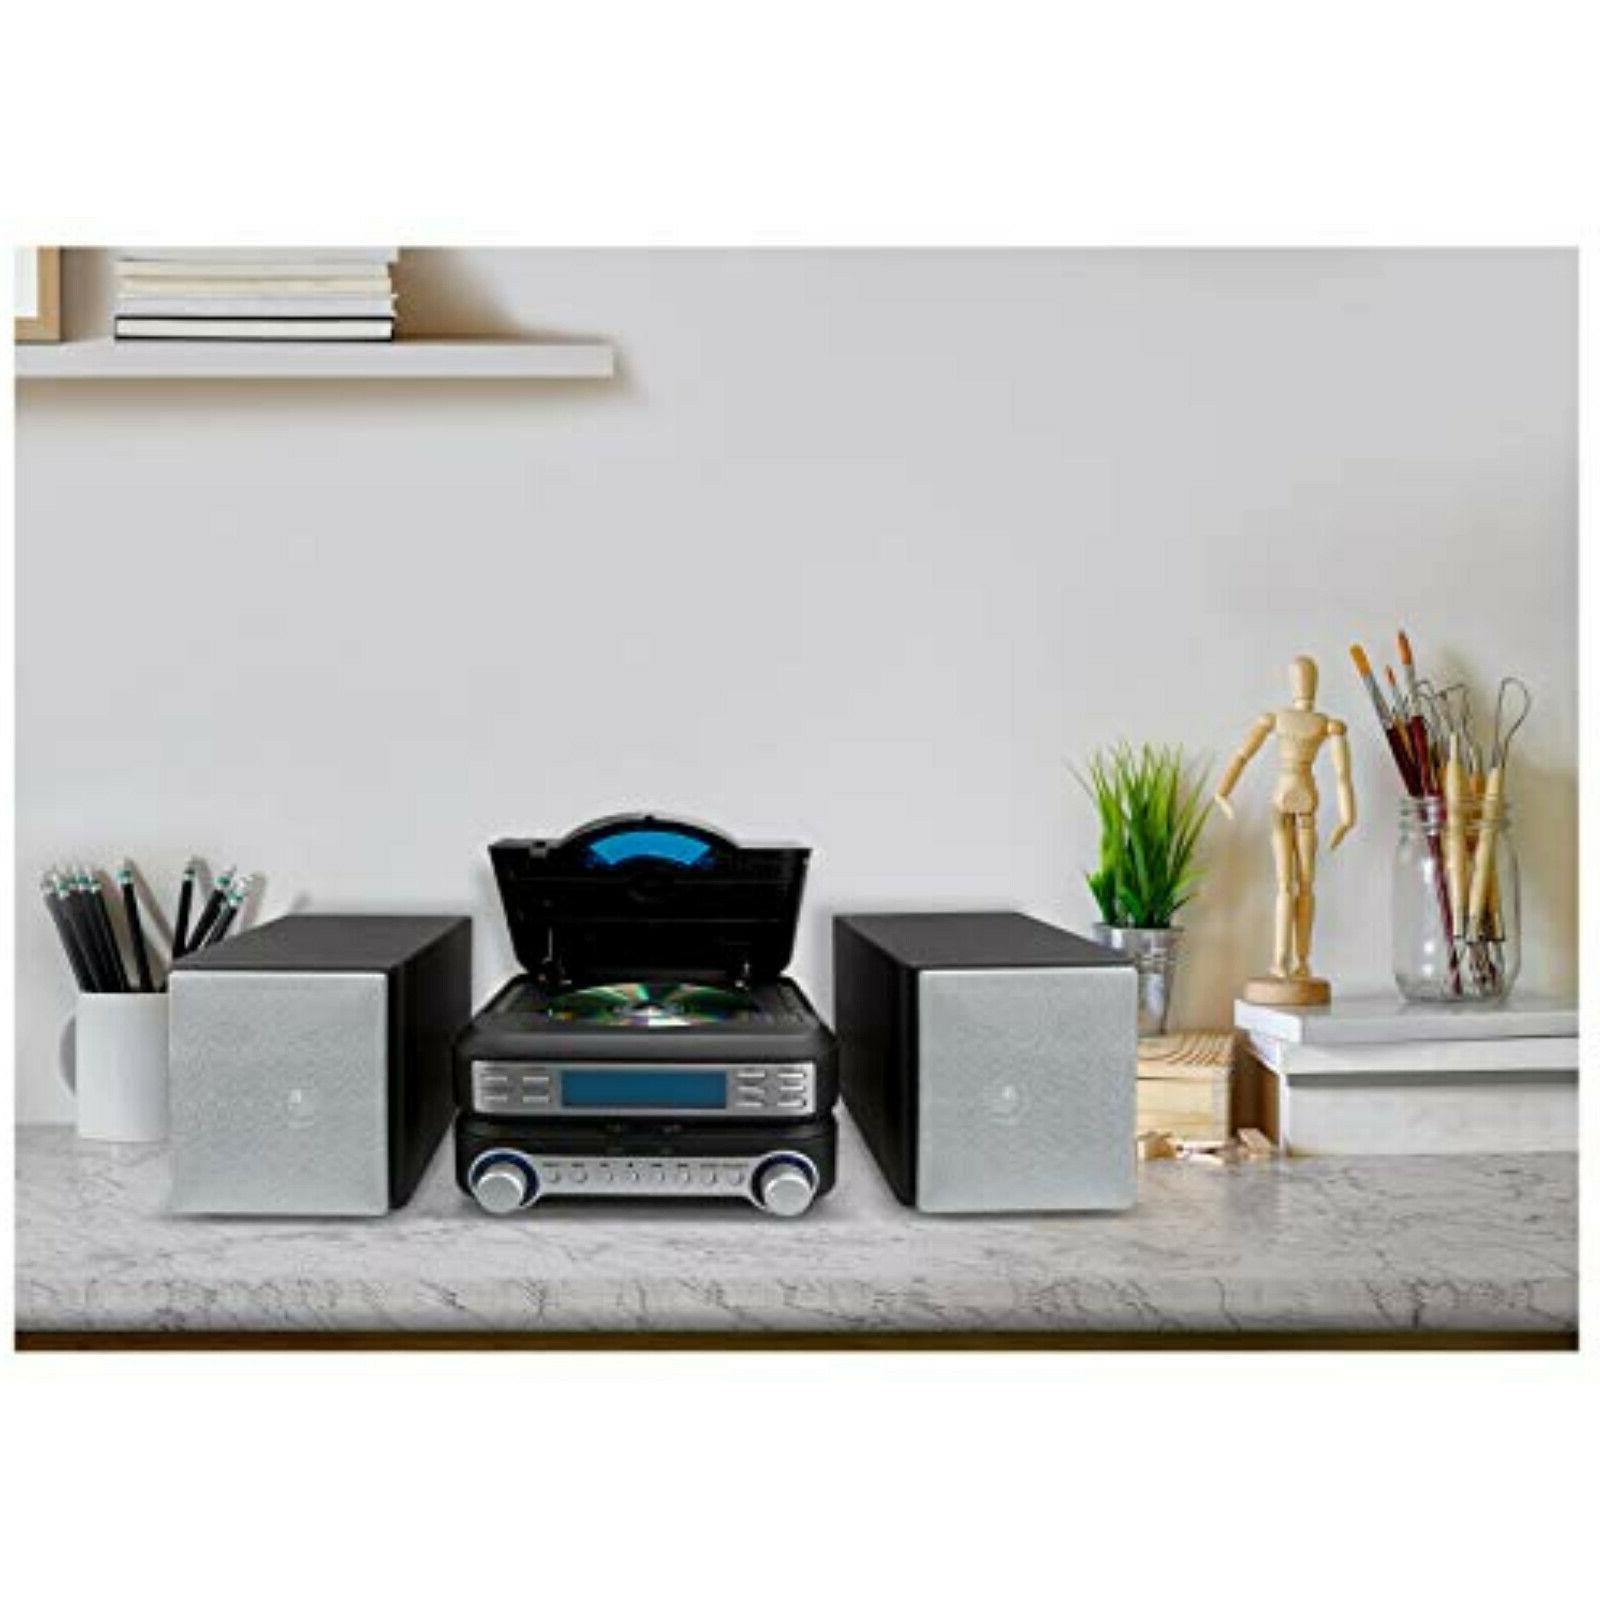 Home System AM FM CD Player Shelf Speakers Bookshelf Remote